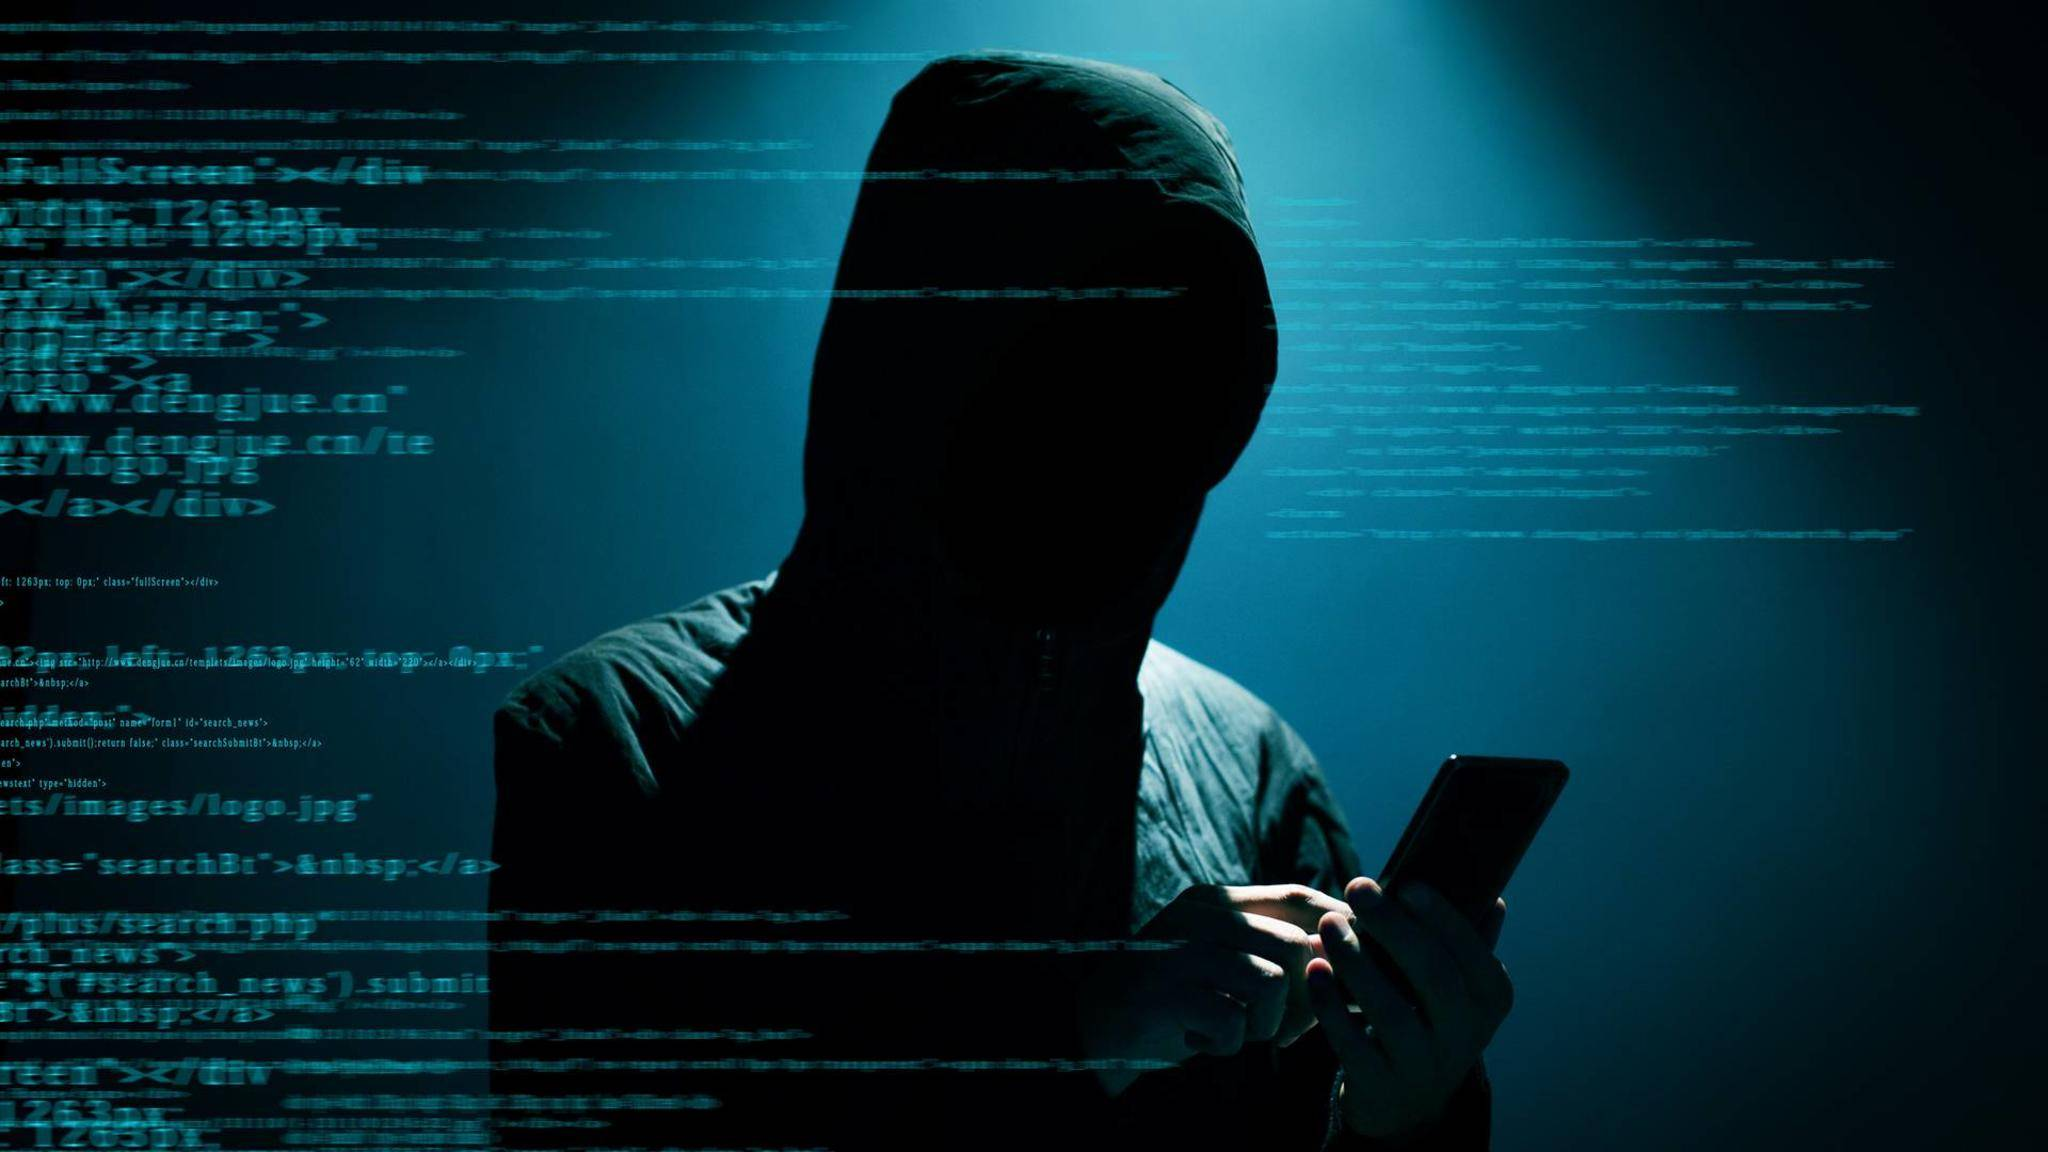 Hacker haben offenbar jahrelang unbemerkt iPhones attackiert.